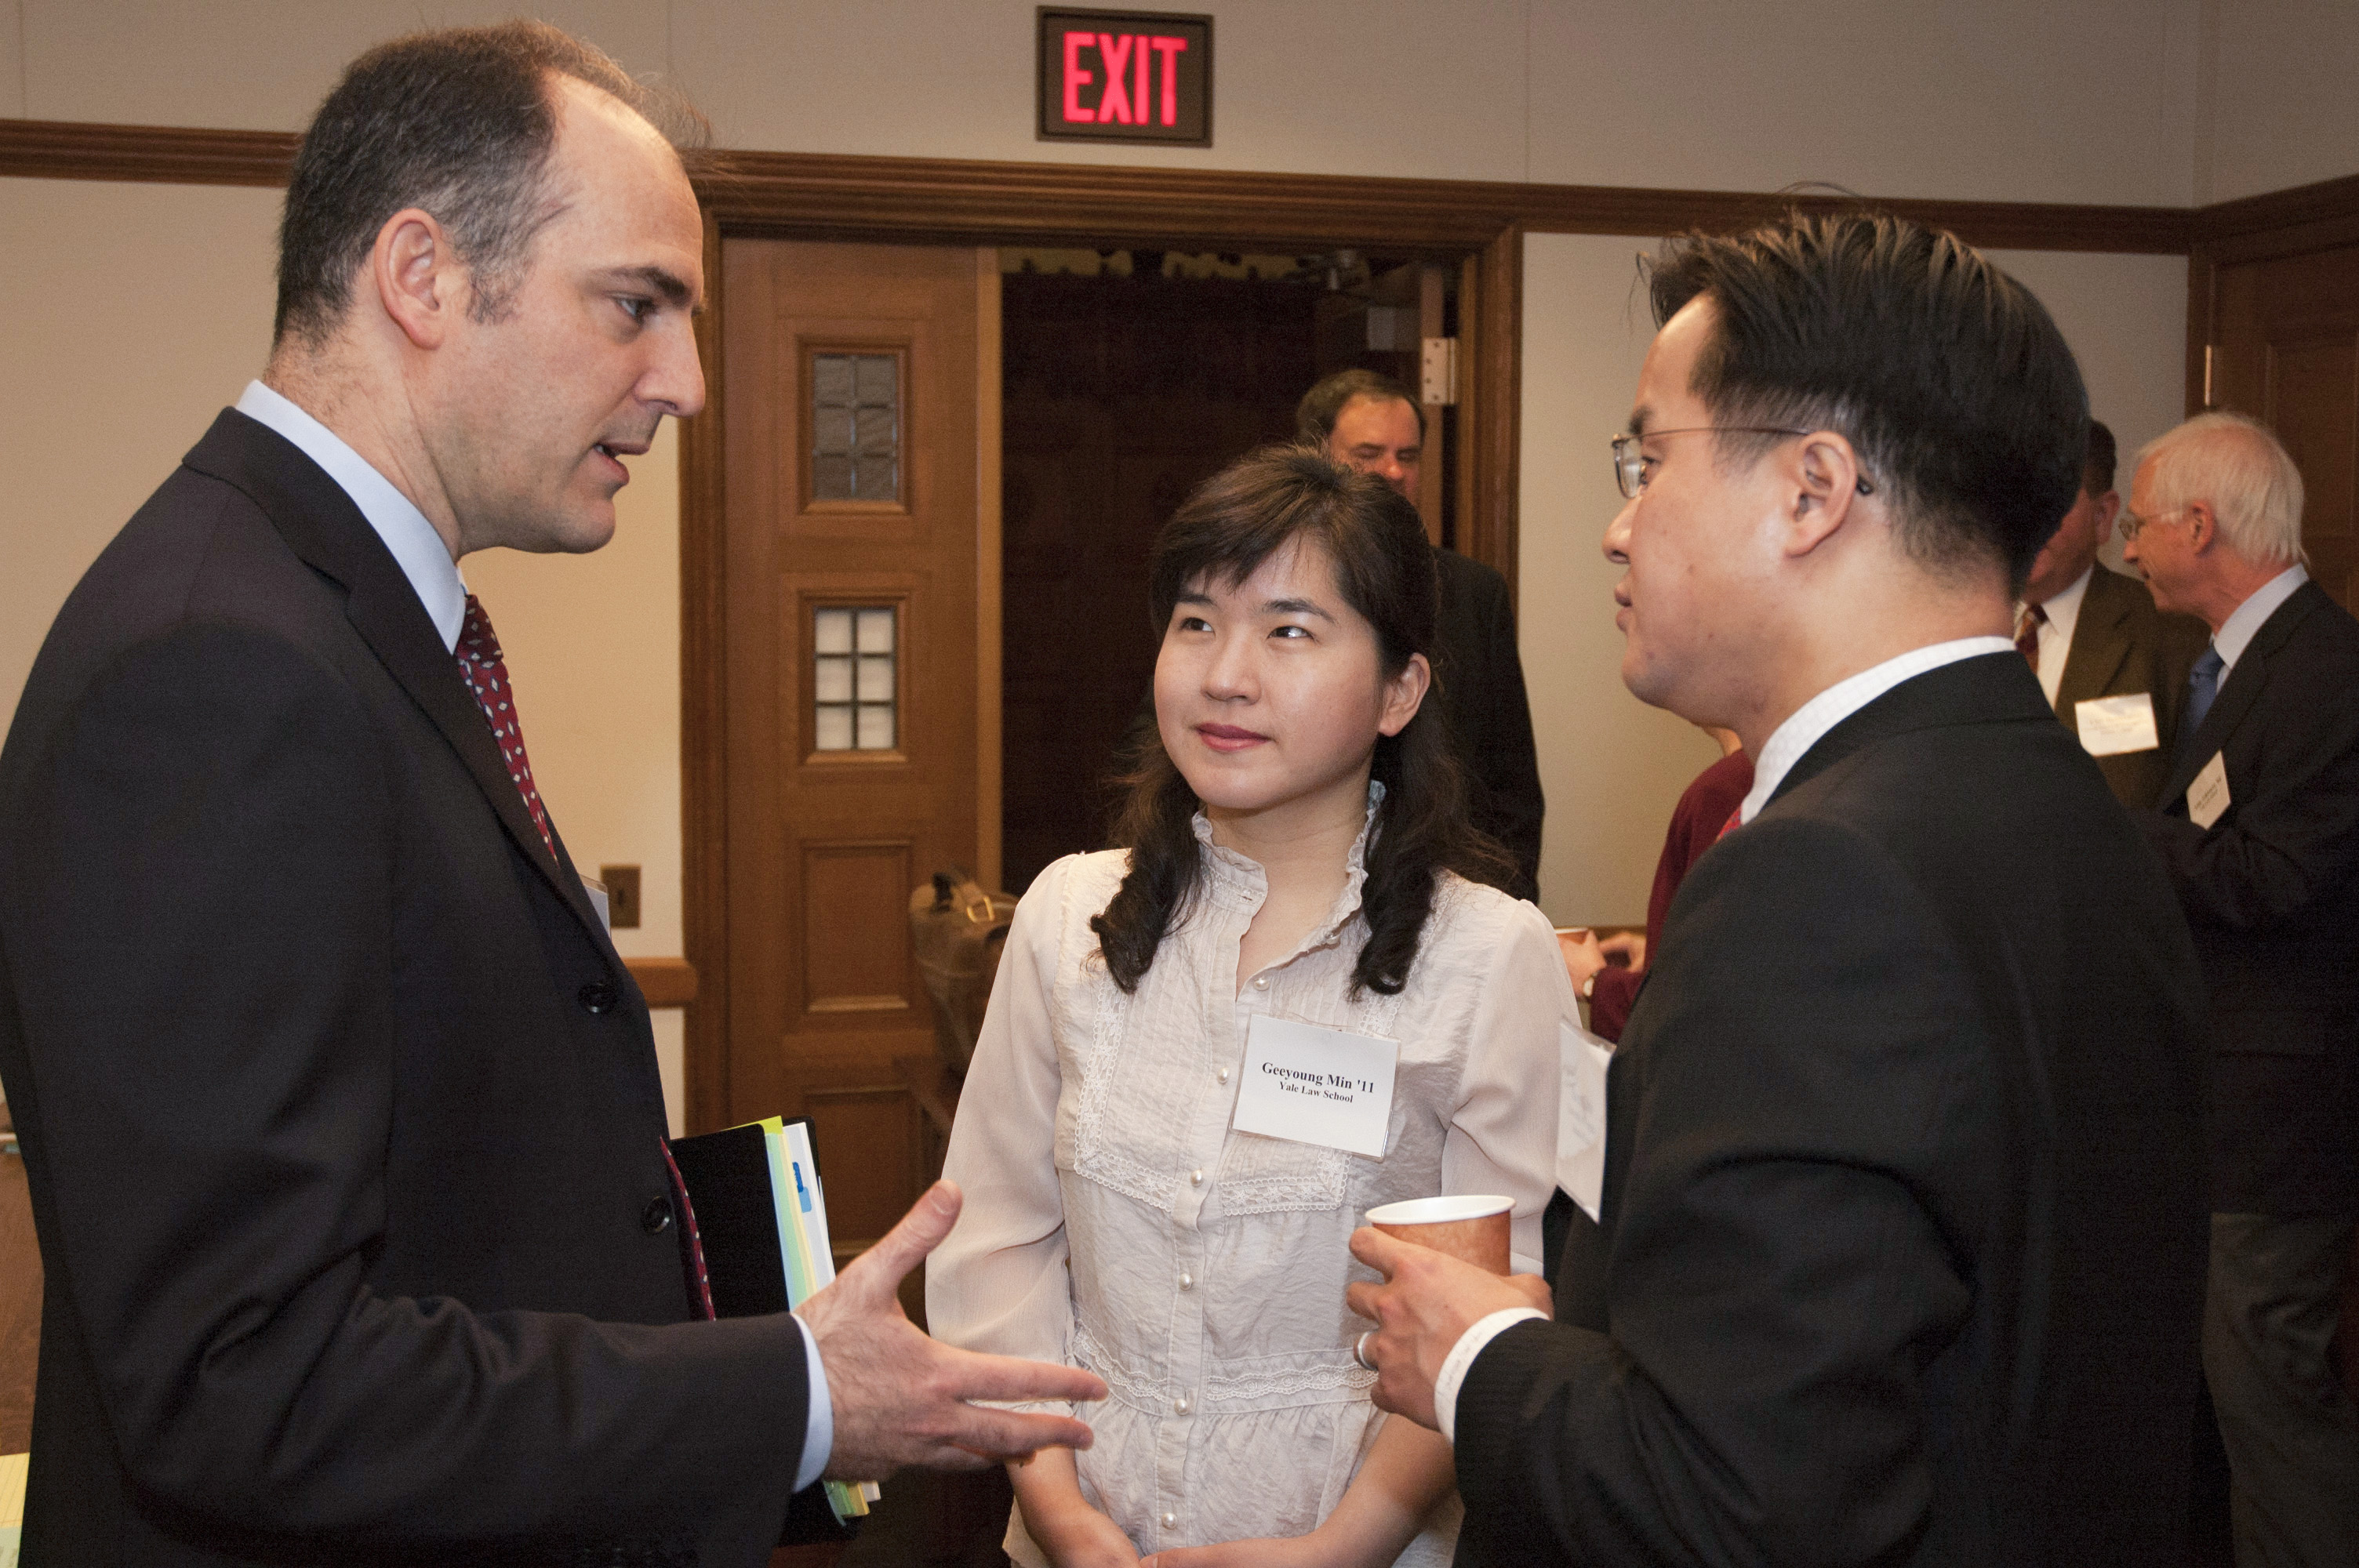 USC Law Prof. Ehud Kamar, Geeyoung Min LLM '05, and UVA Law Prof. Albert Choi '01